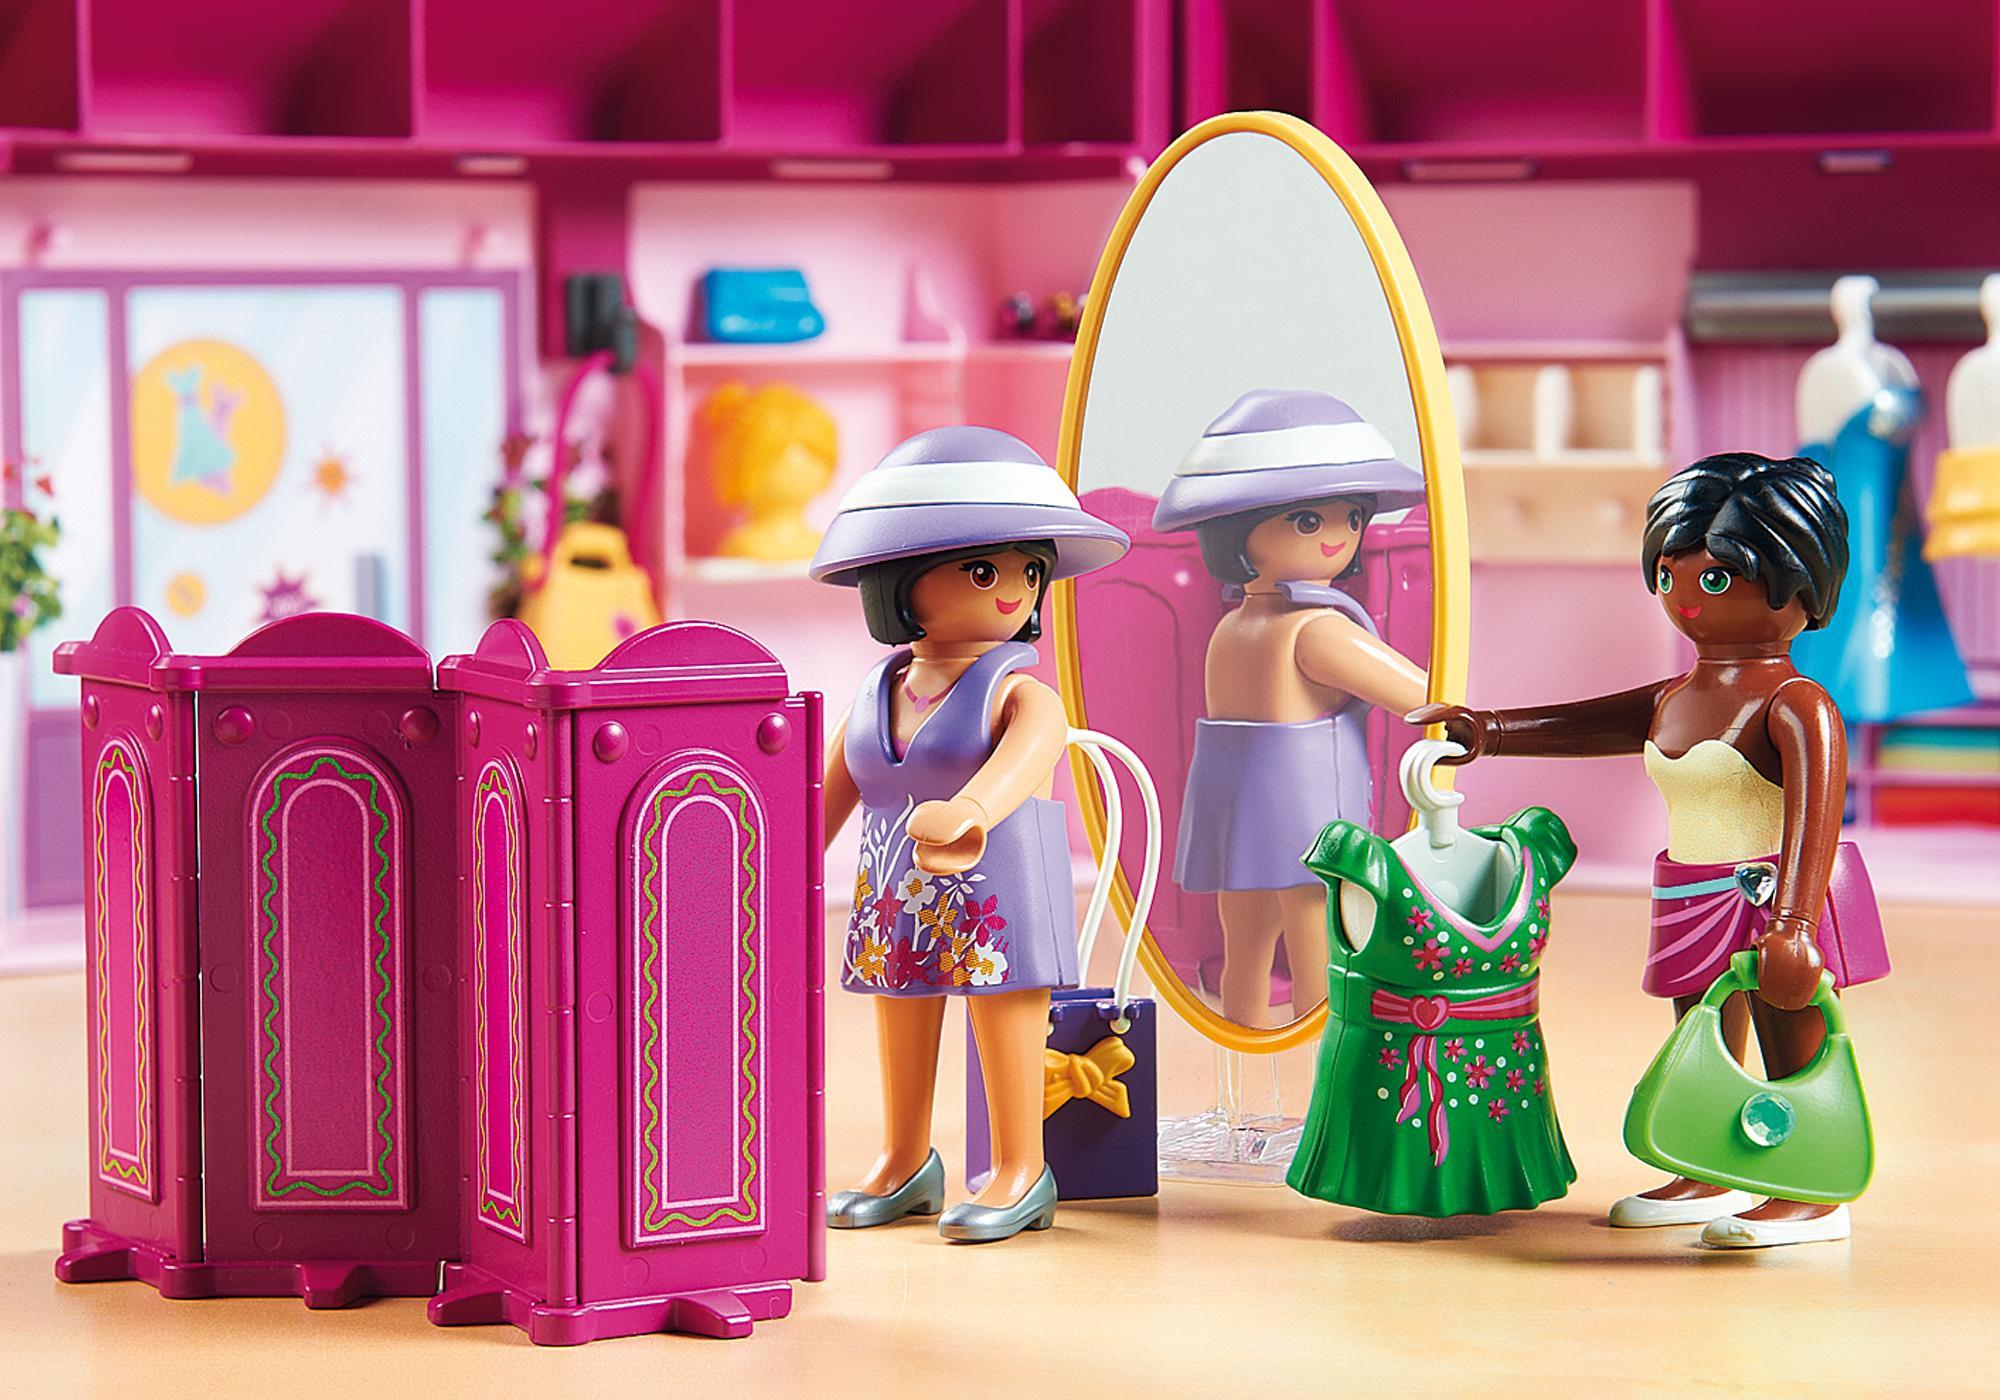 http://media.playmobil.com/i/playmobil/6862_product_extra1/Tienda de Moda Maletín